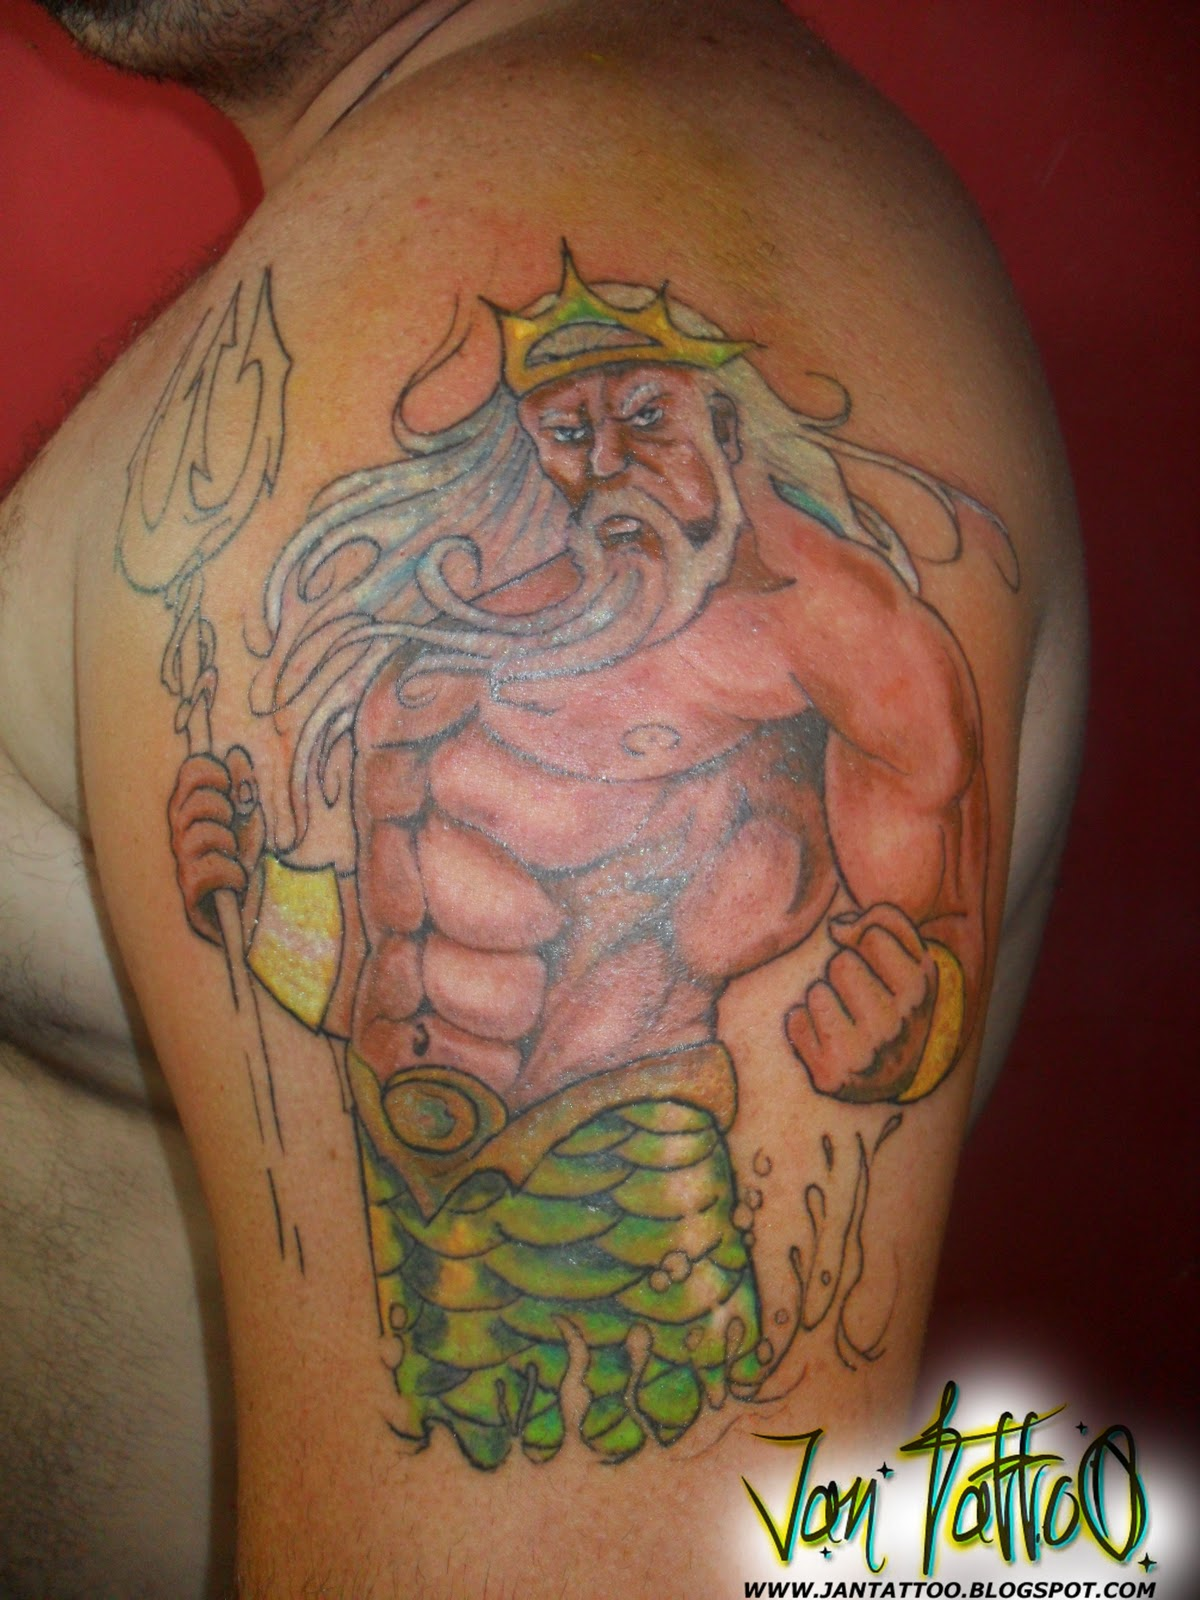 Татуировки с трезубцем фото